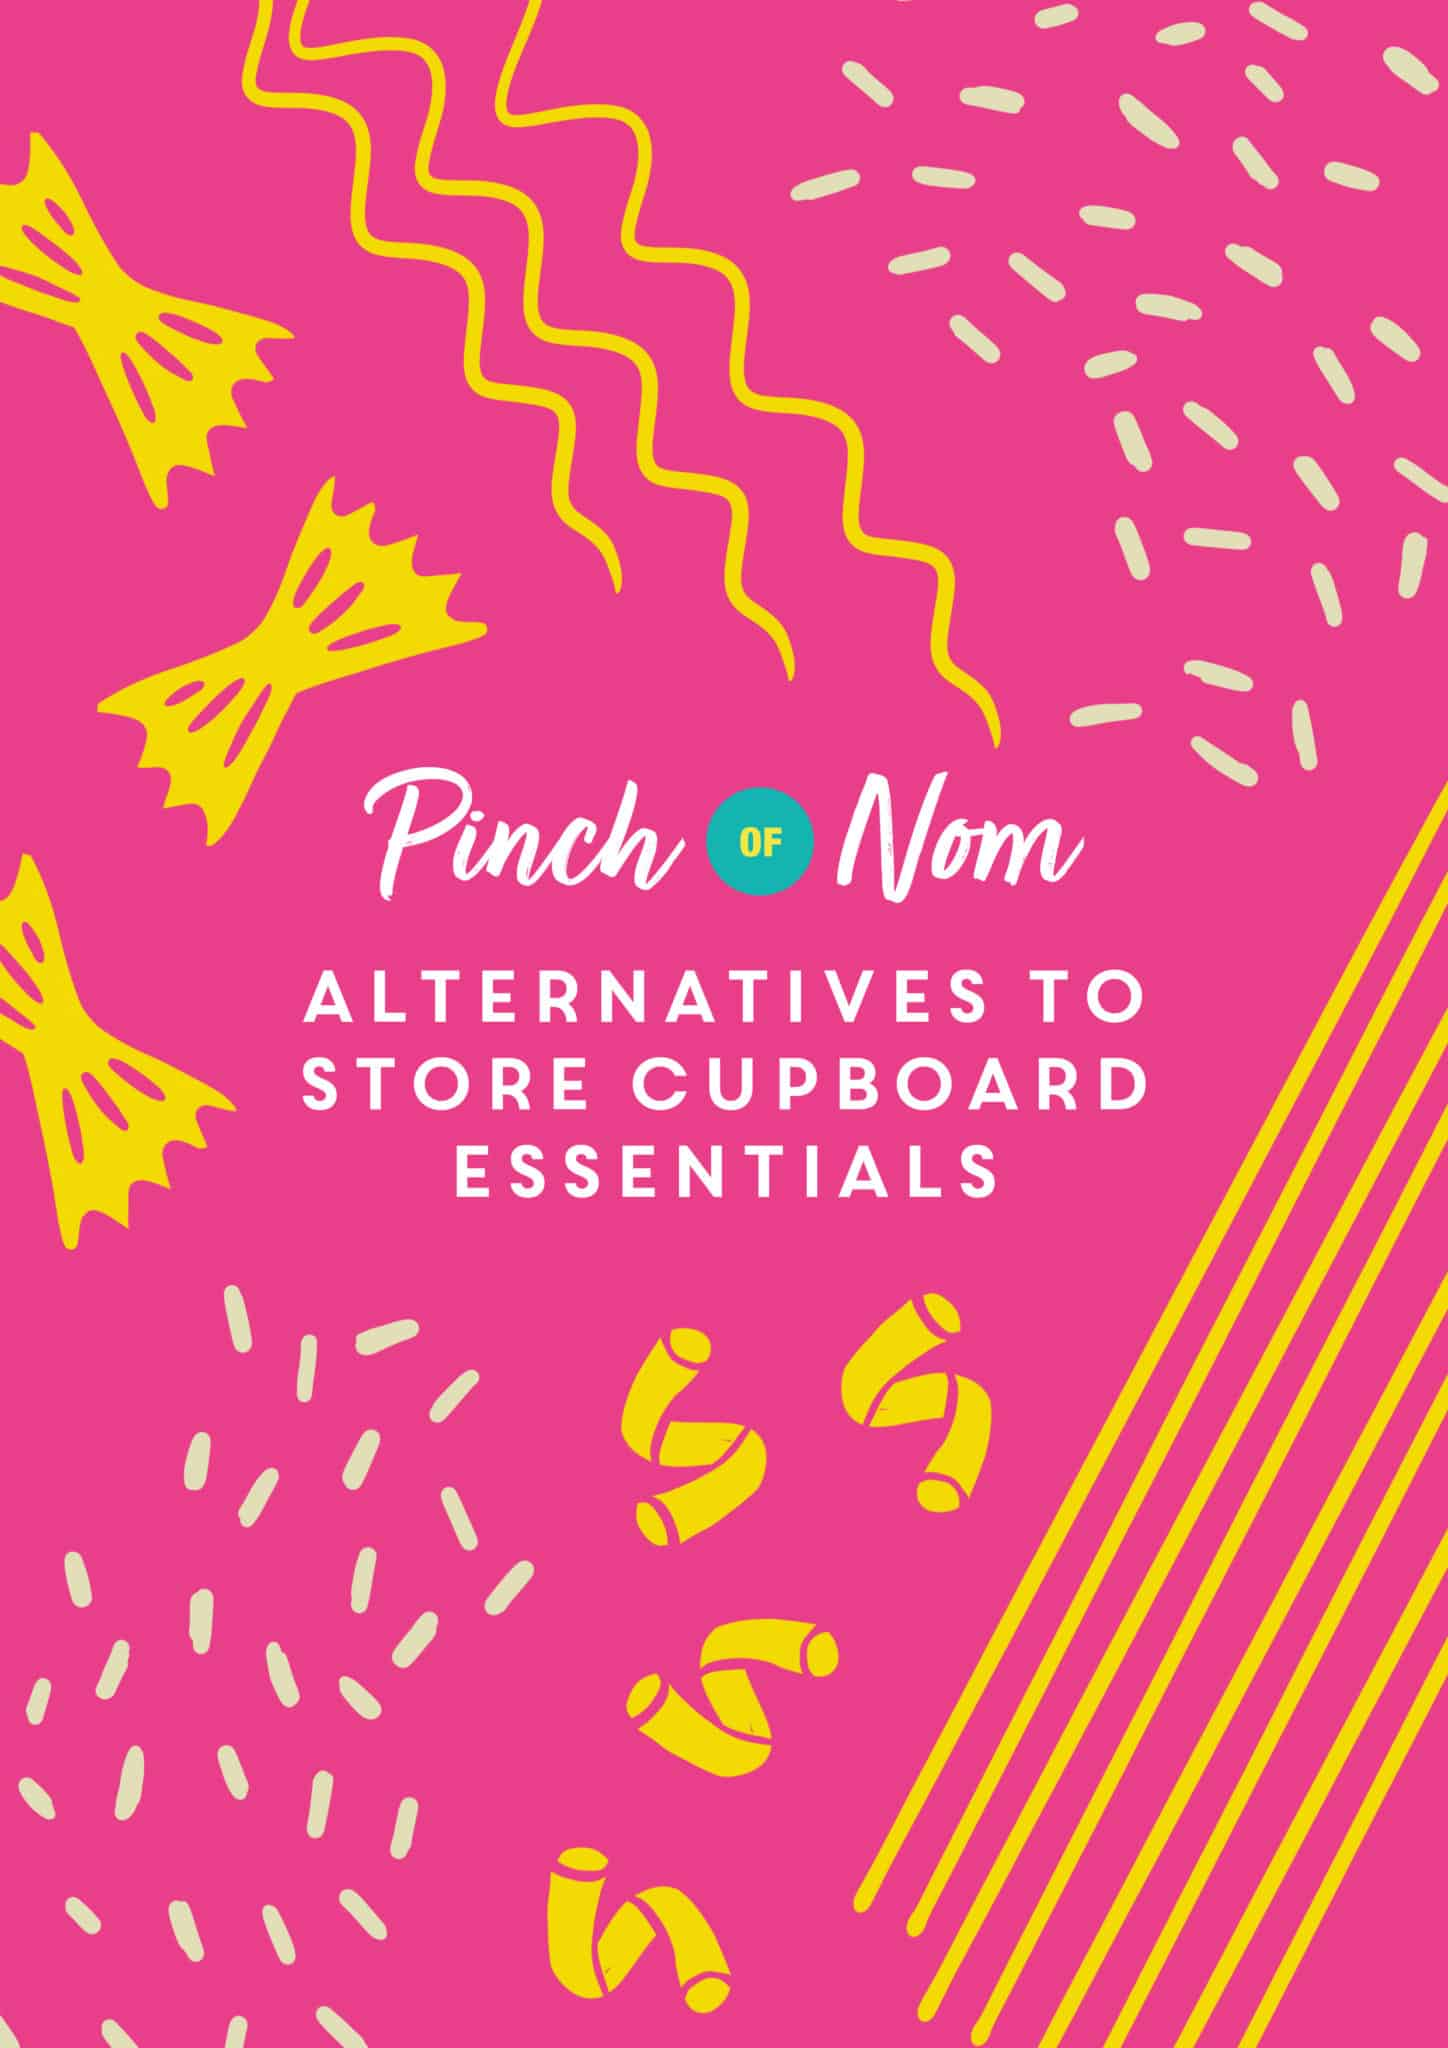 Alternatives to store cupboard essentials   Pinch of Nom Slimming Recipes